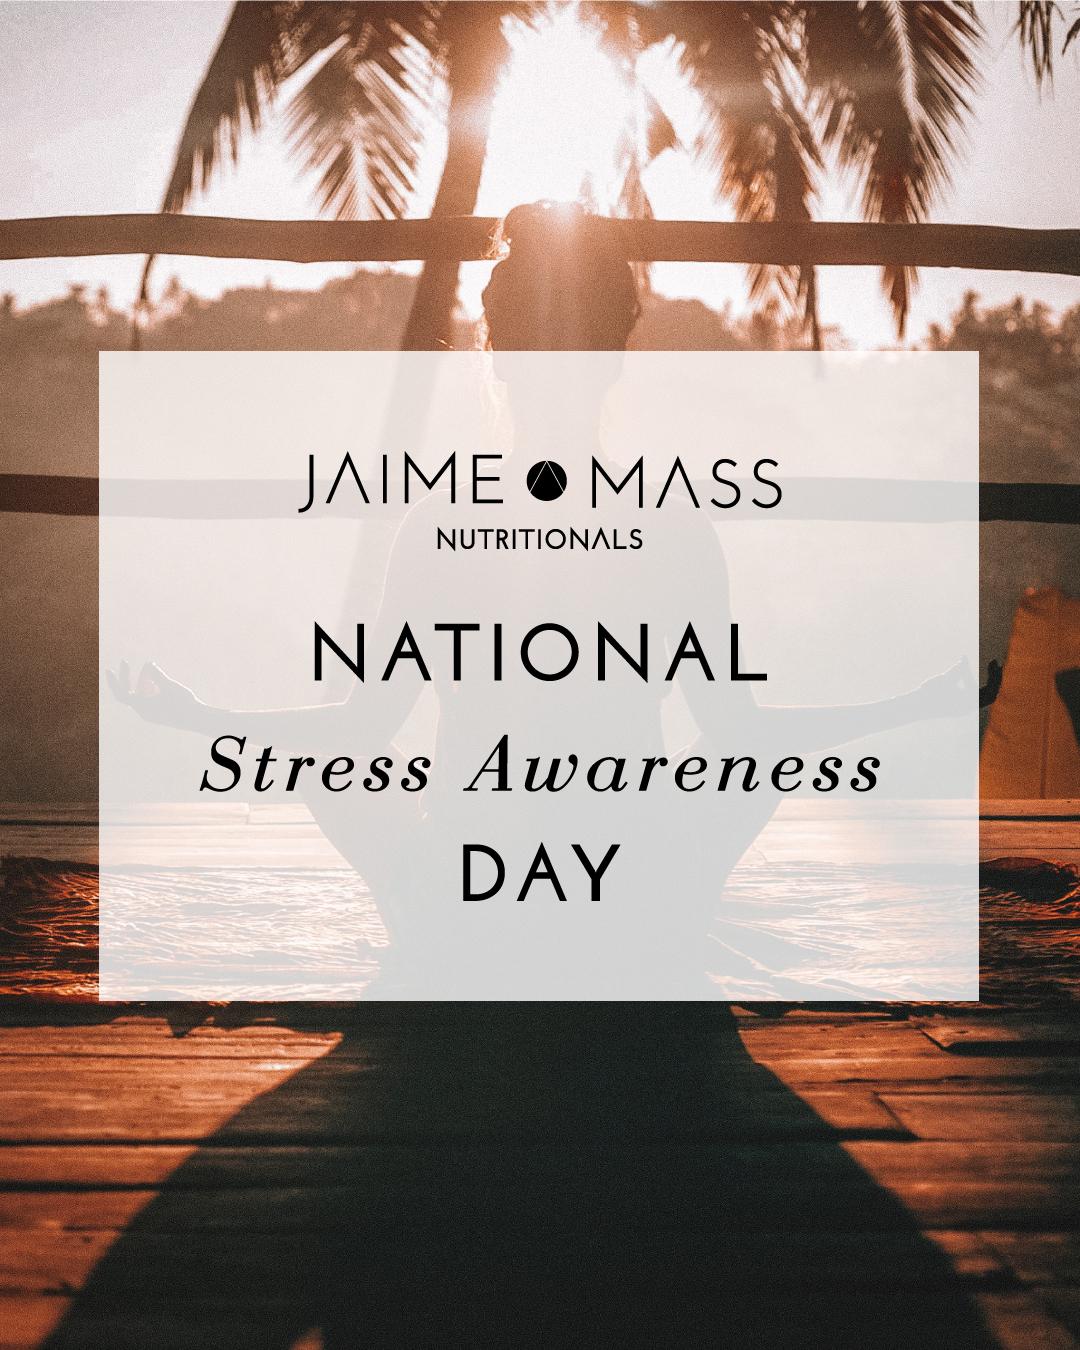 National Stress Awareness Day - Jaime Mass Nutritionals